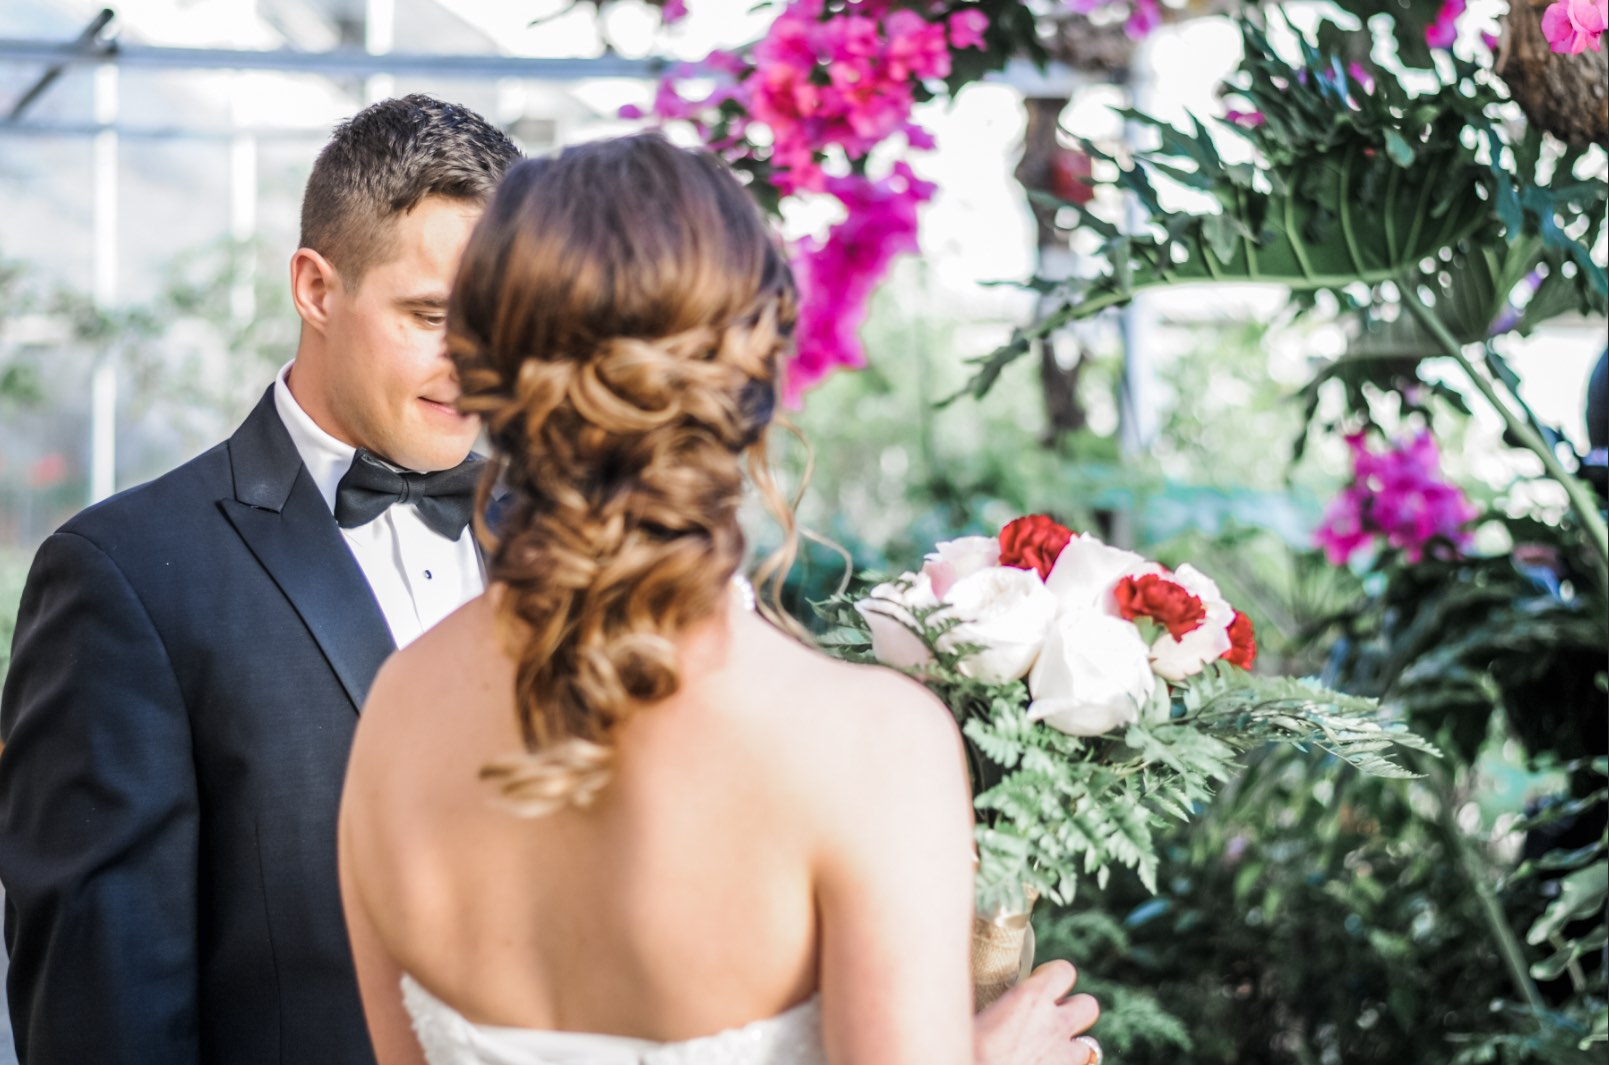 GOT wedding hair ideas